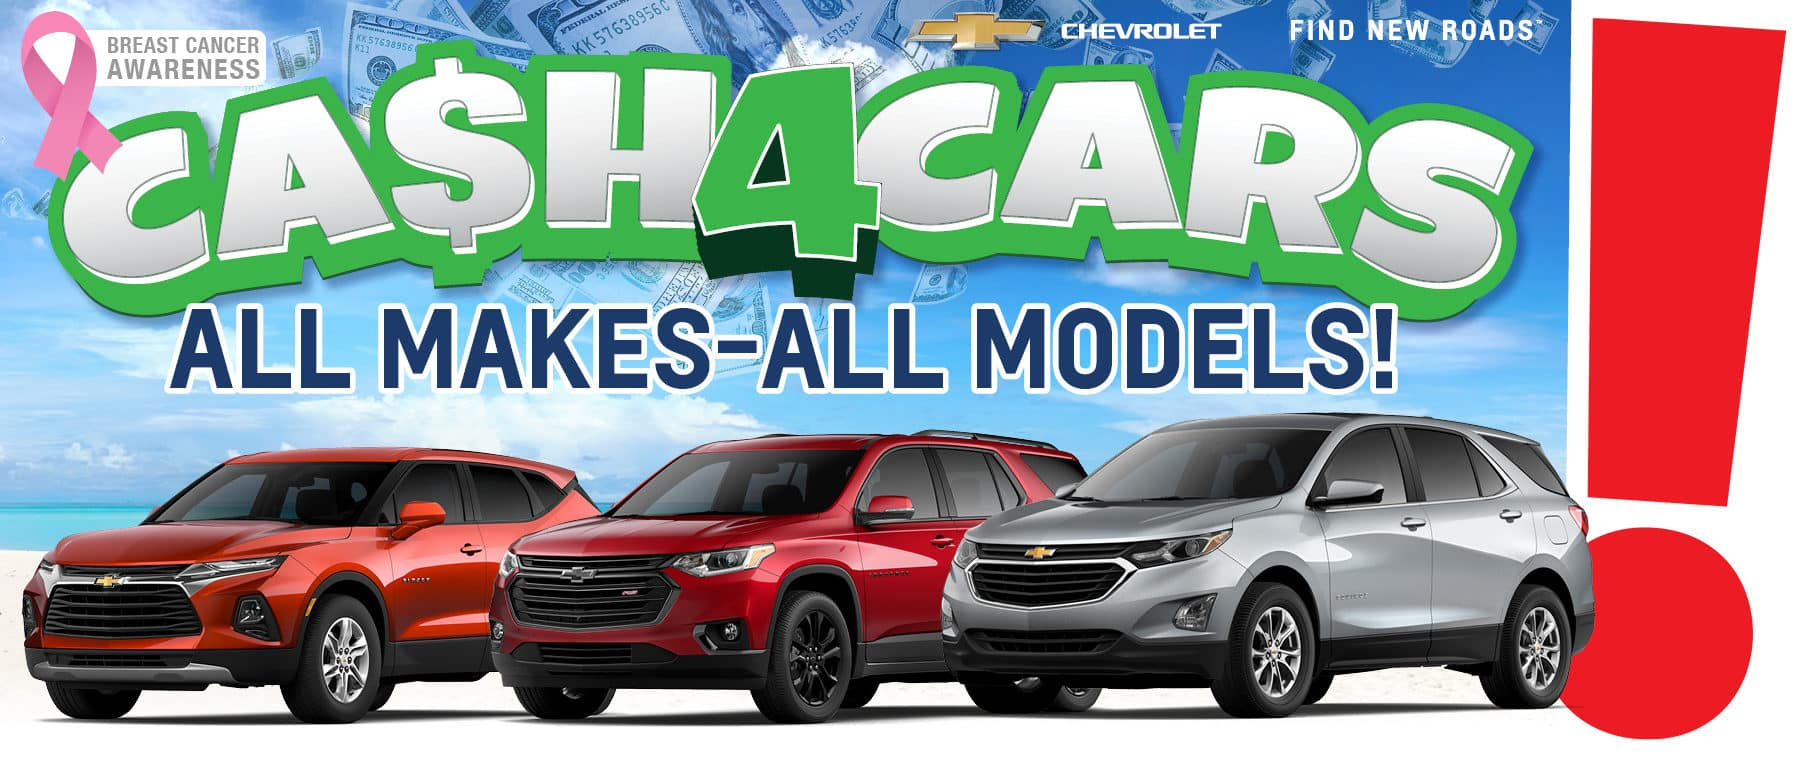 AD0724 DC – HP 1800X760 – Cash4Cars